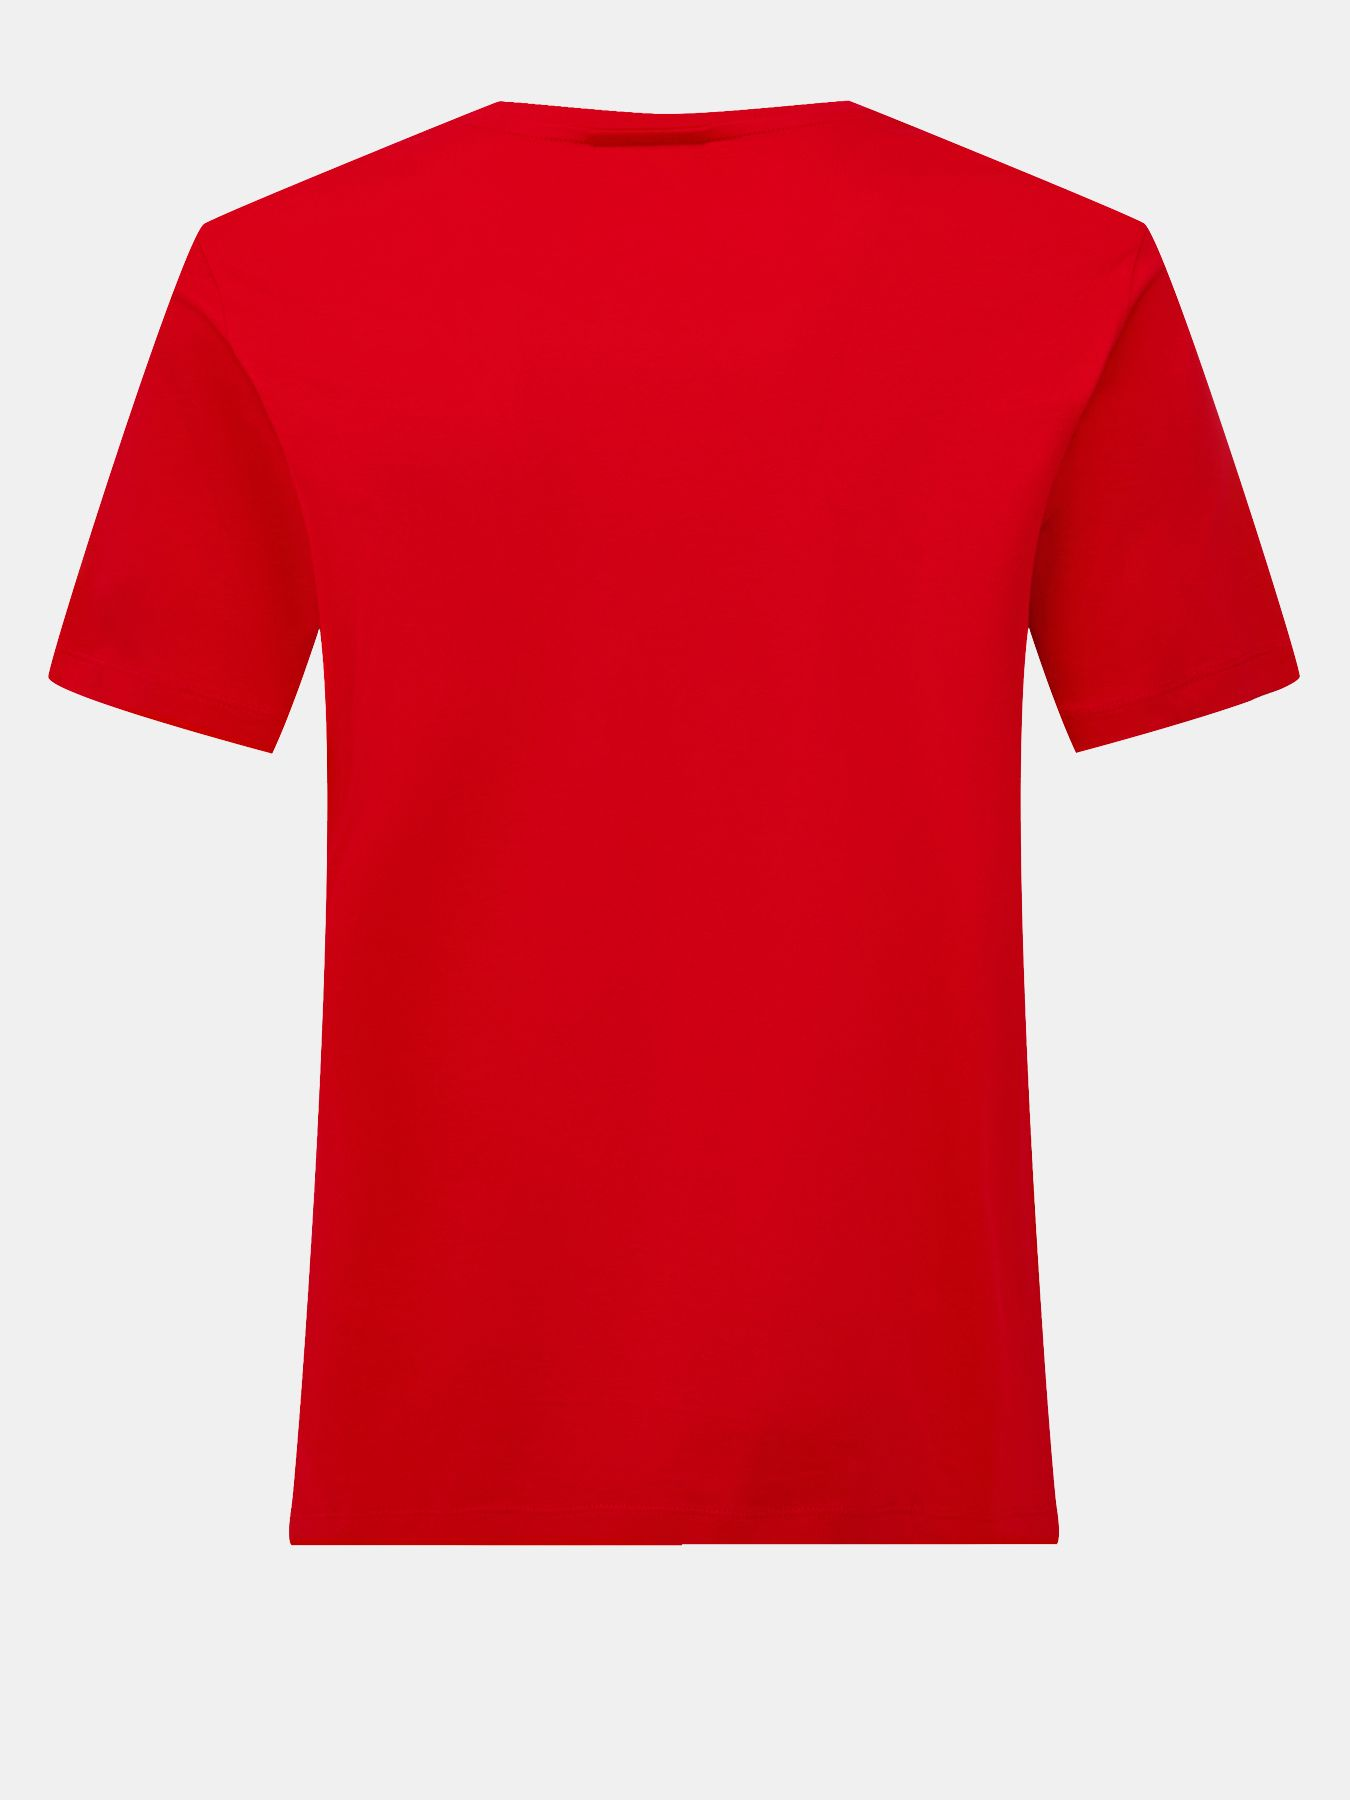 Фуфайка (футболка) HUGO Футболка Durned фуфайка футболка hugo футболка drosal